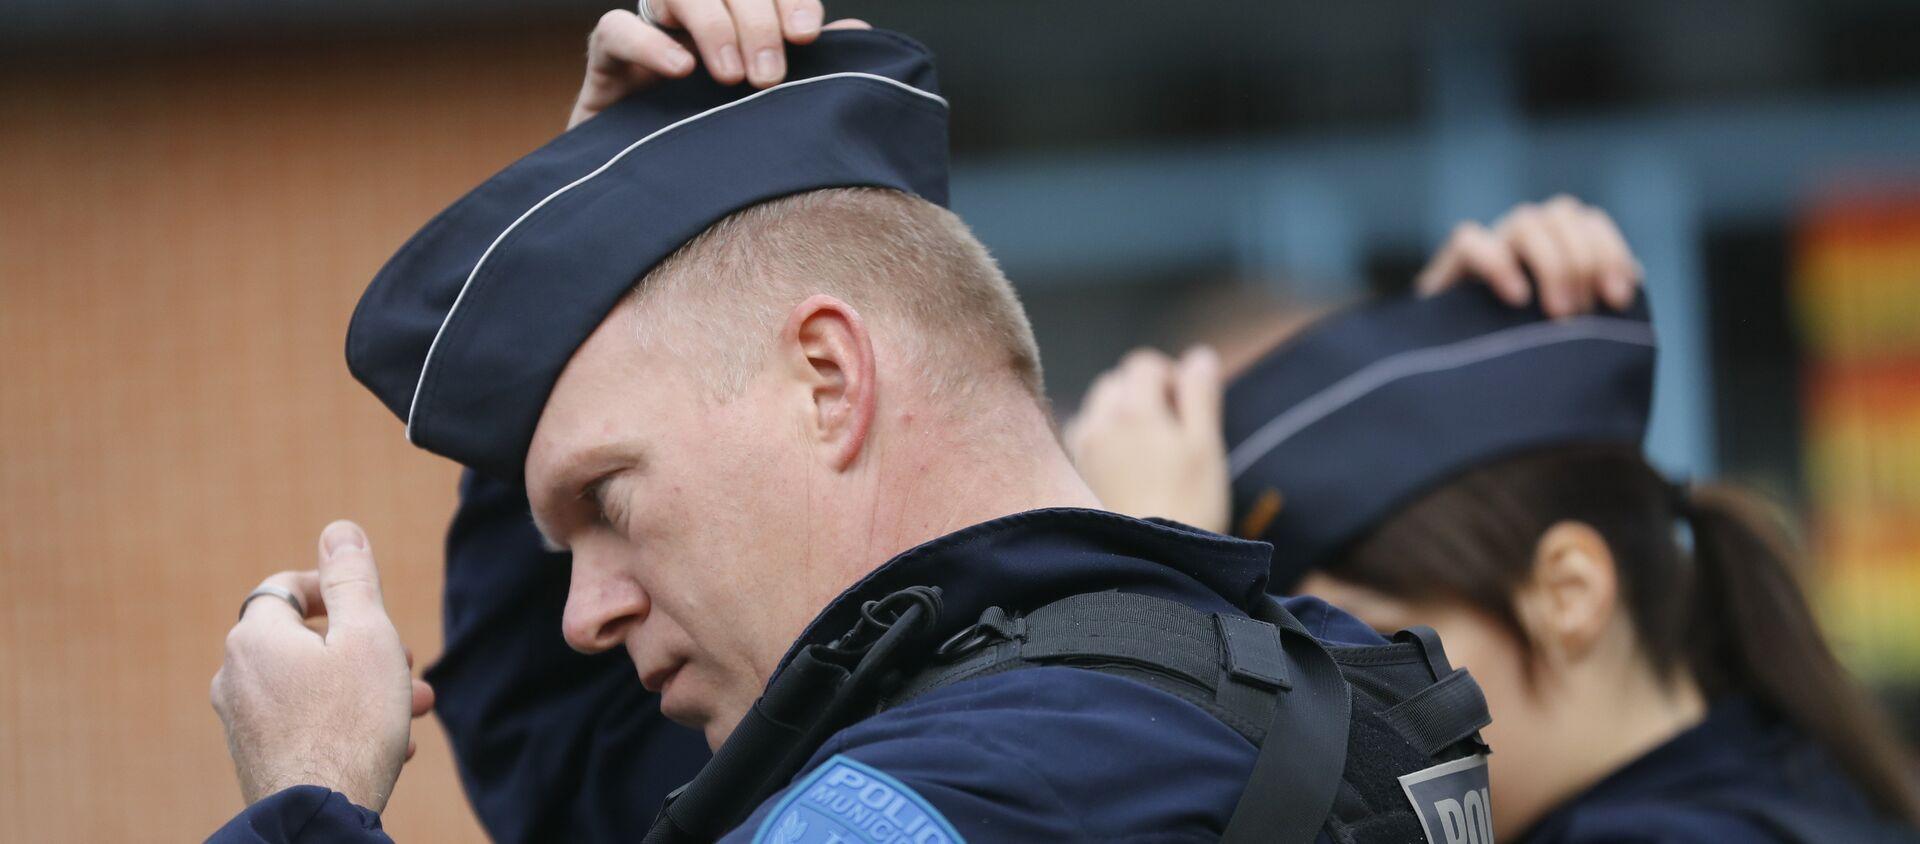 La police municipale française - Sputnik France, 1920, 21.11.2020